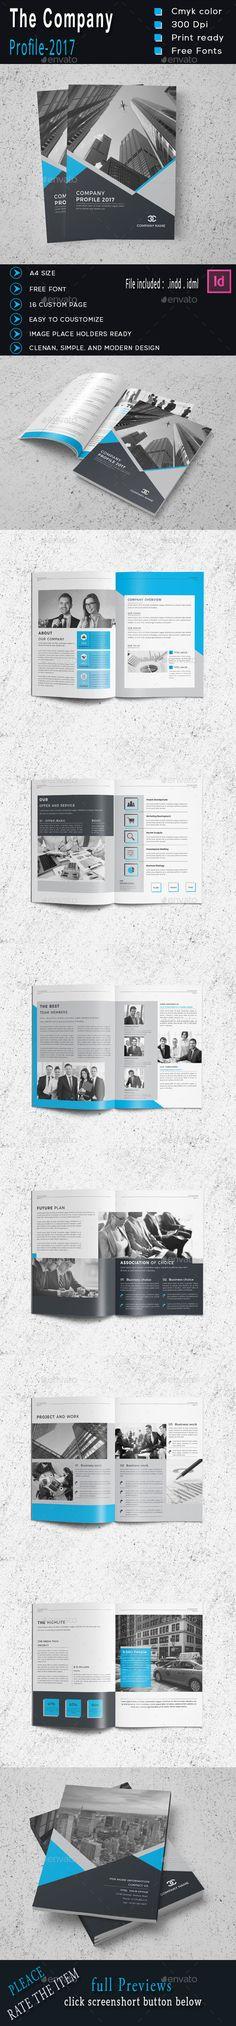 Corporate Bi-Fold Brochure   Brochures, Design and Brochure template